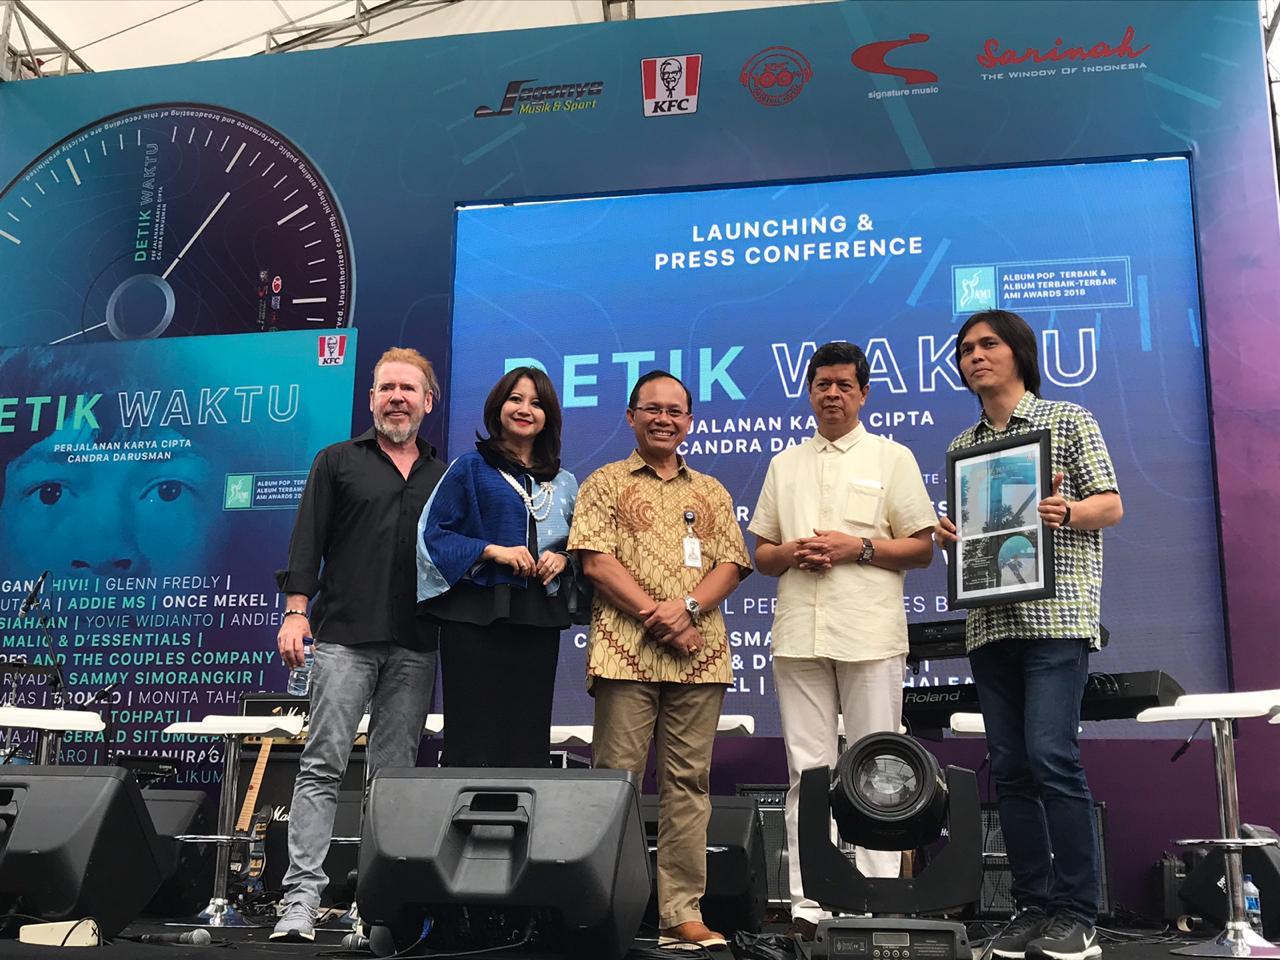 Rilis Ulang 'Detik Waktu Perjalanan Karya Cipta Candra Darusman' , Tambah 2 Lagu